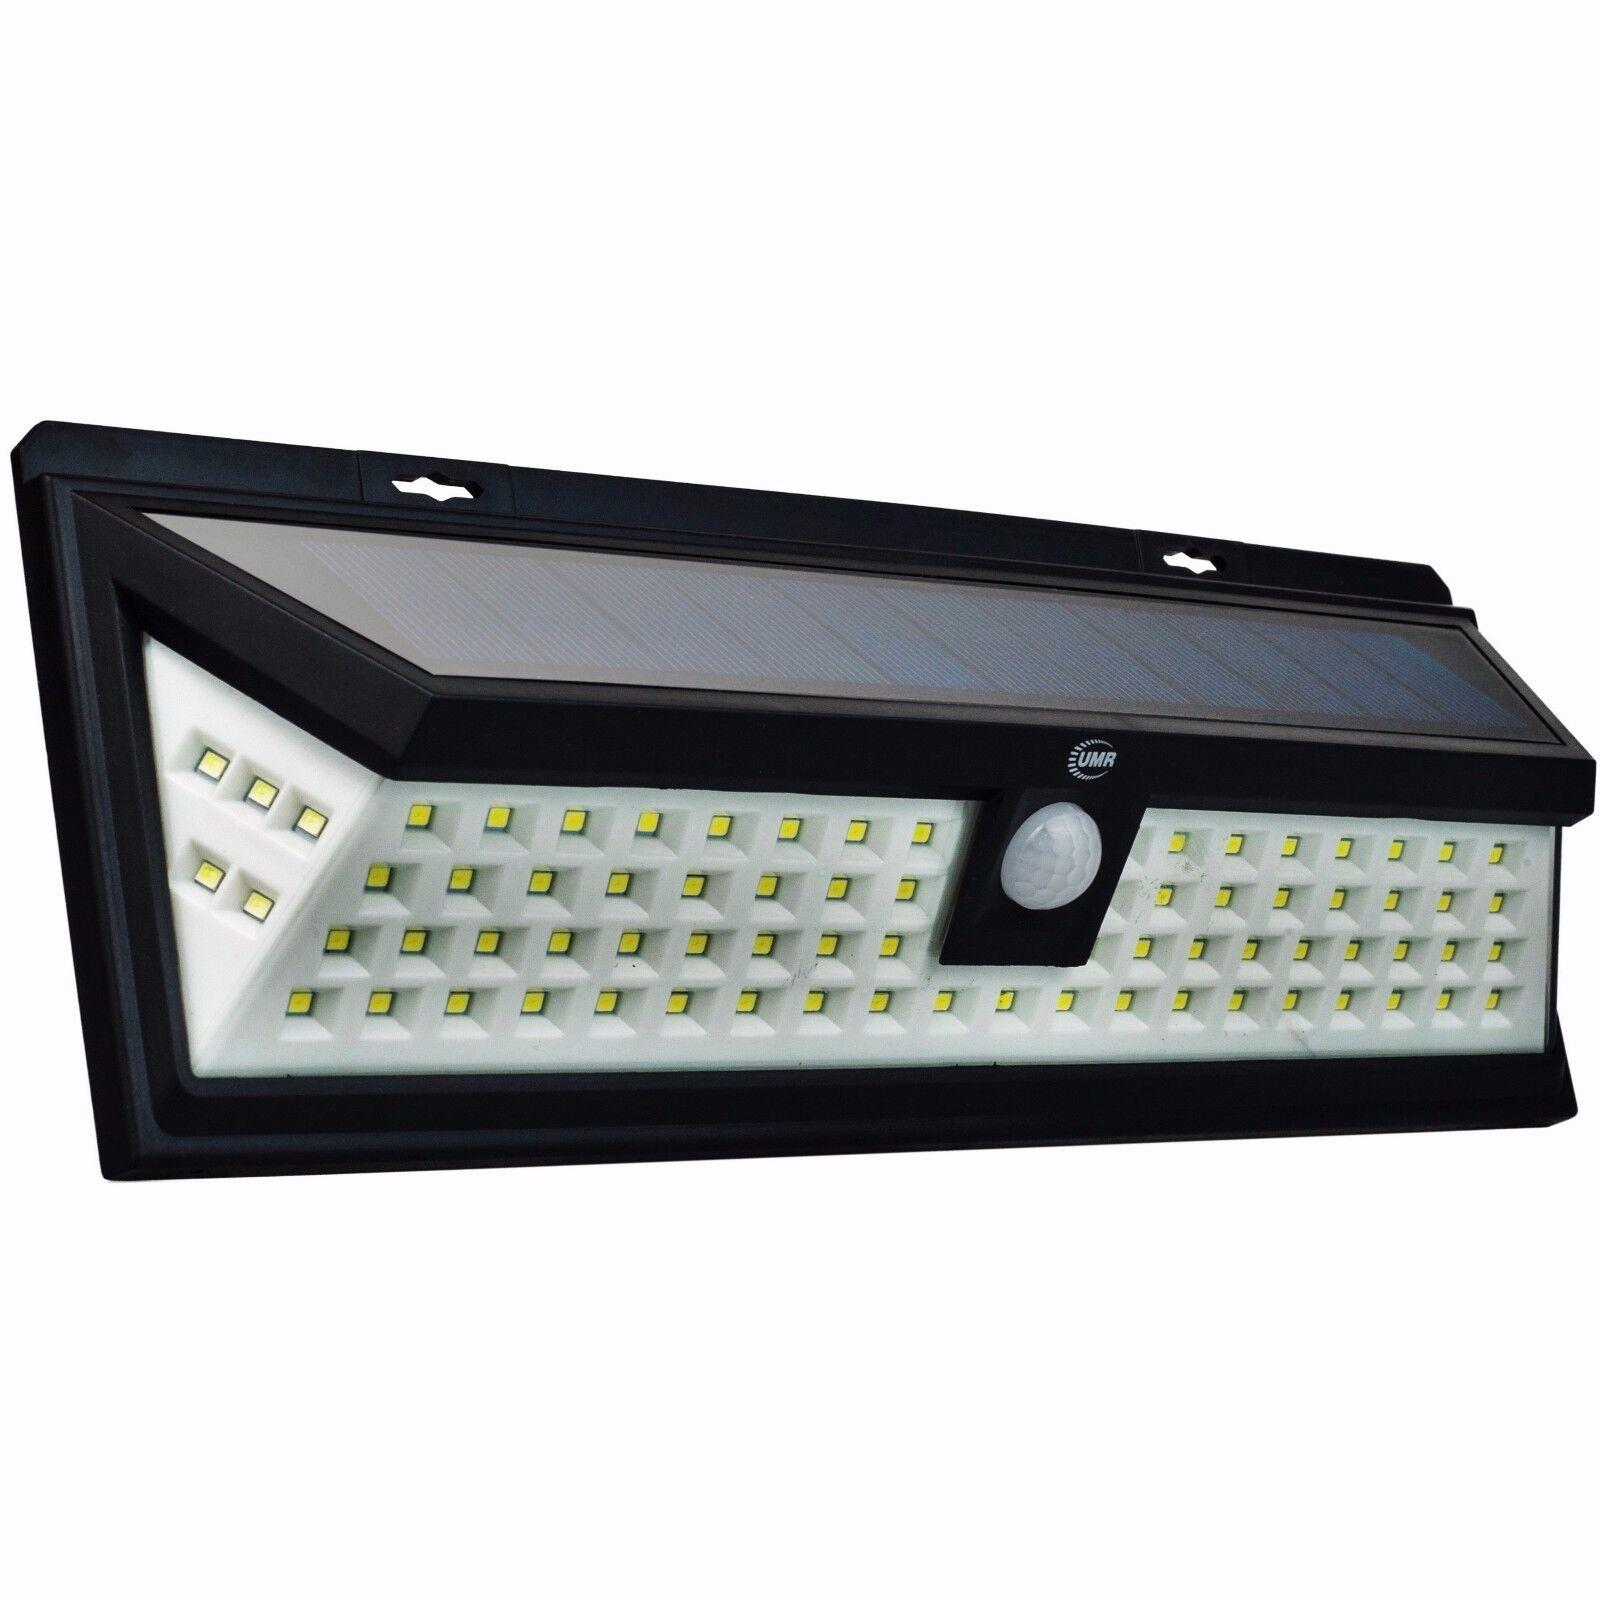 80 LED Solar Security Light Dusk to Dawn | BRIGHT Outdoor Motion Sensor Lighting